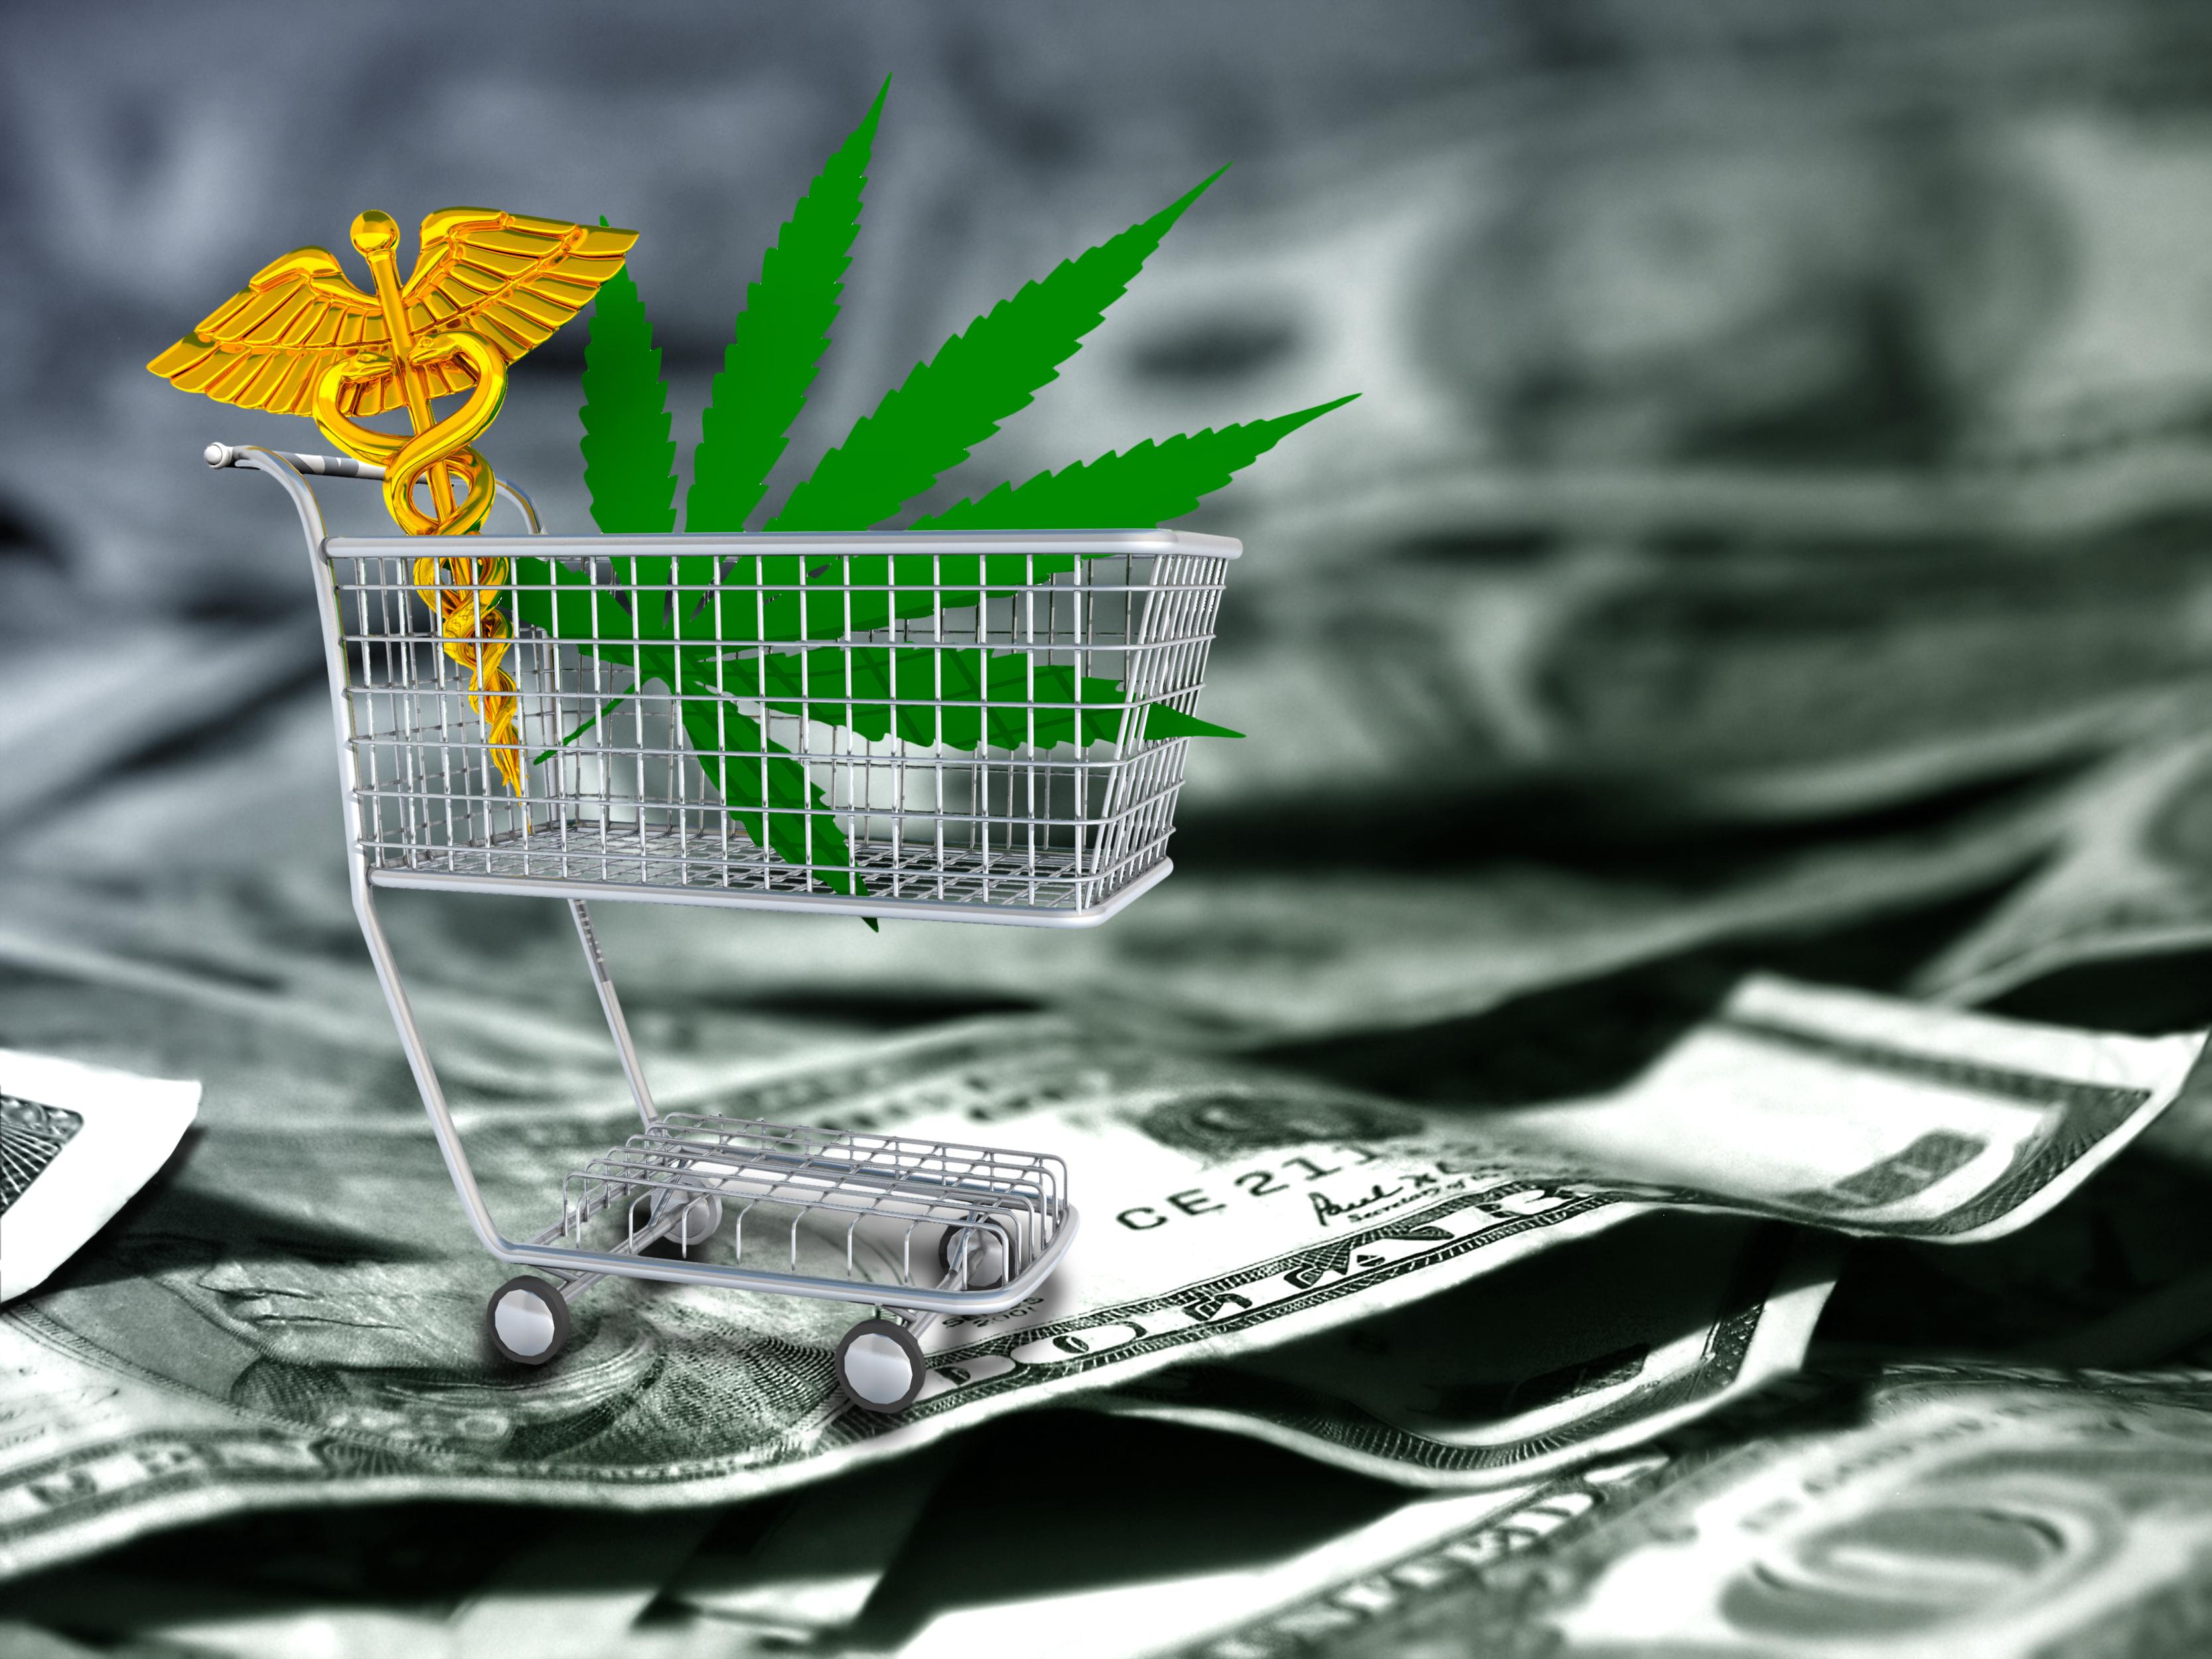 Marijuana leaf and caduceus in cart on top of money